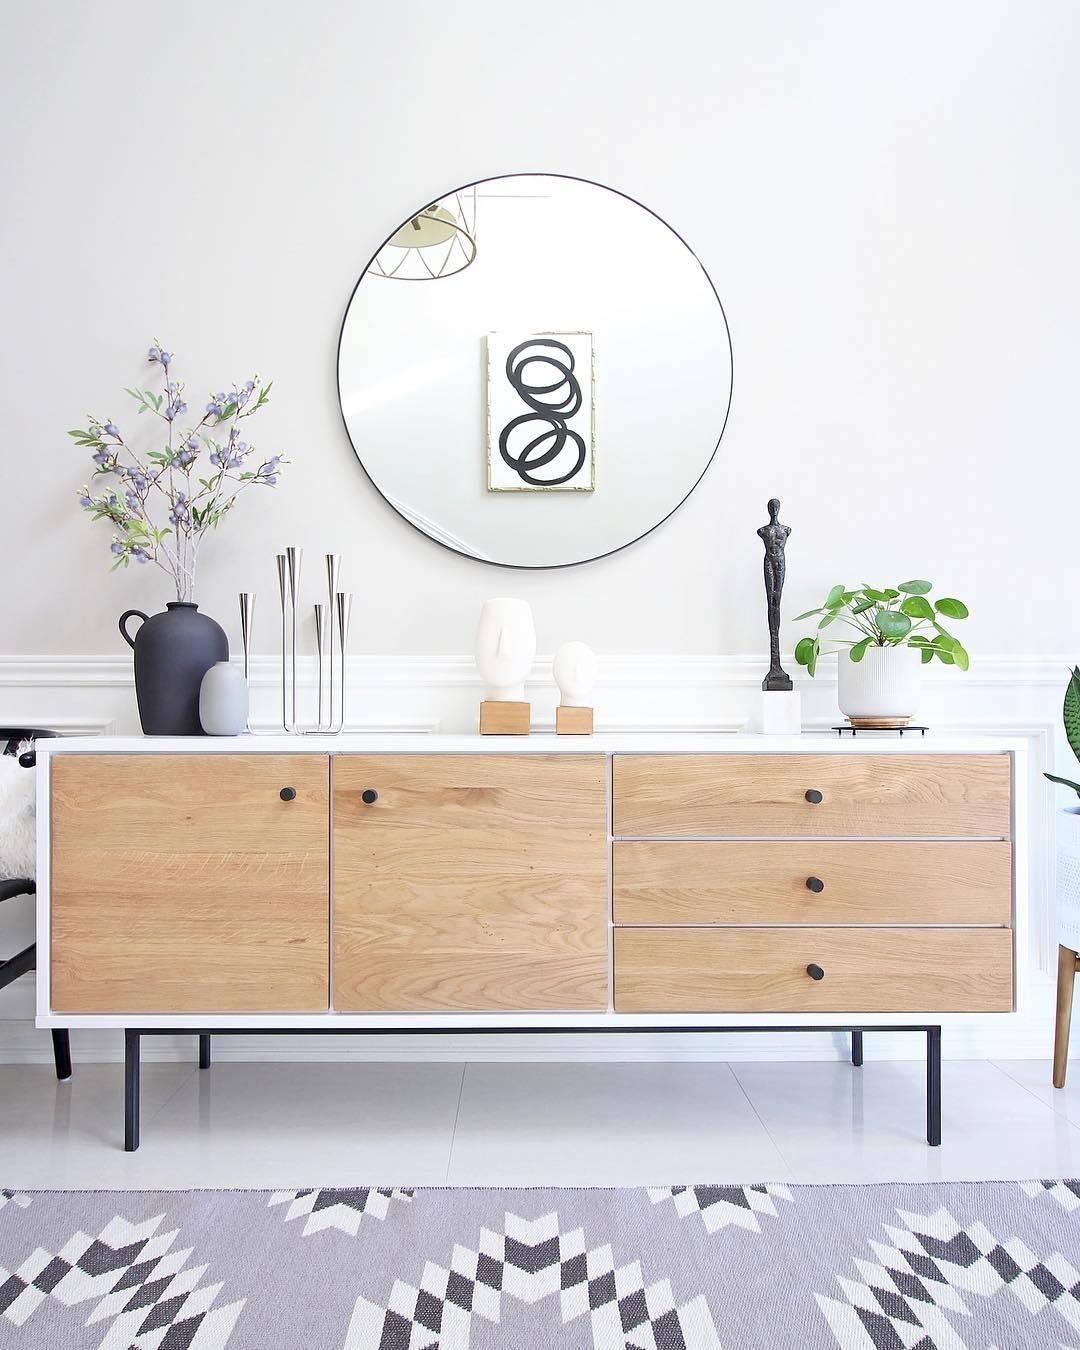 Bios Sideboard Article Sideboard Decor Dining Room Sideboard Styles Sideboard Designs